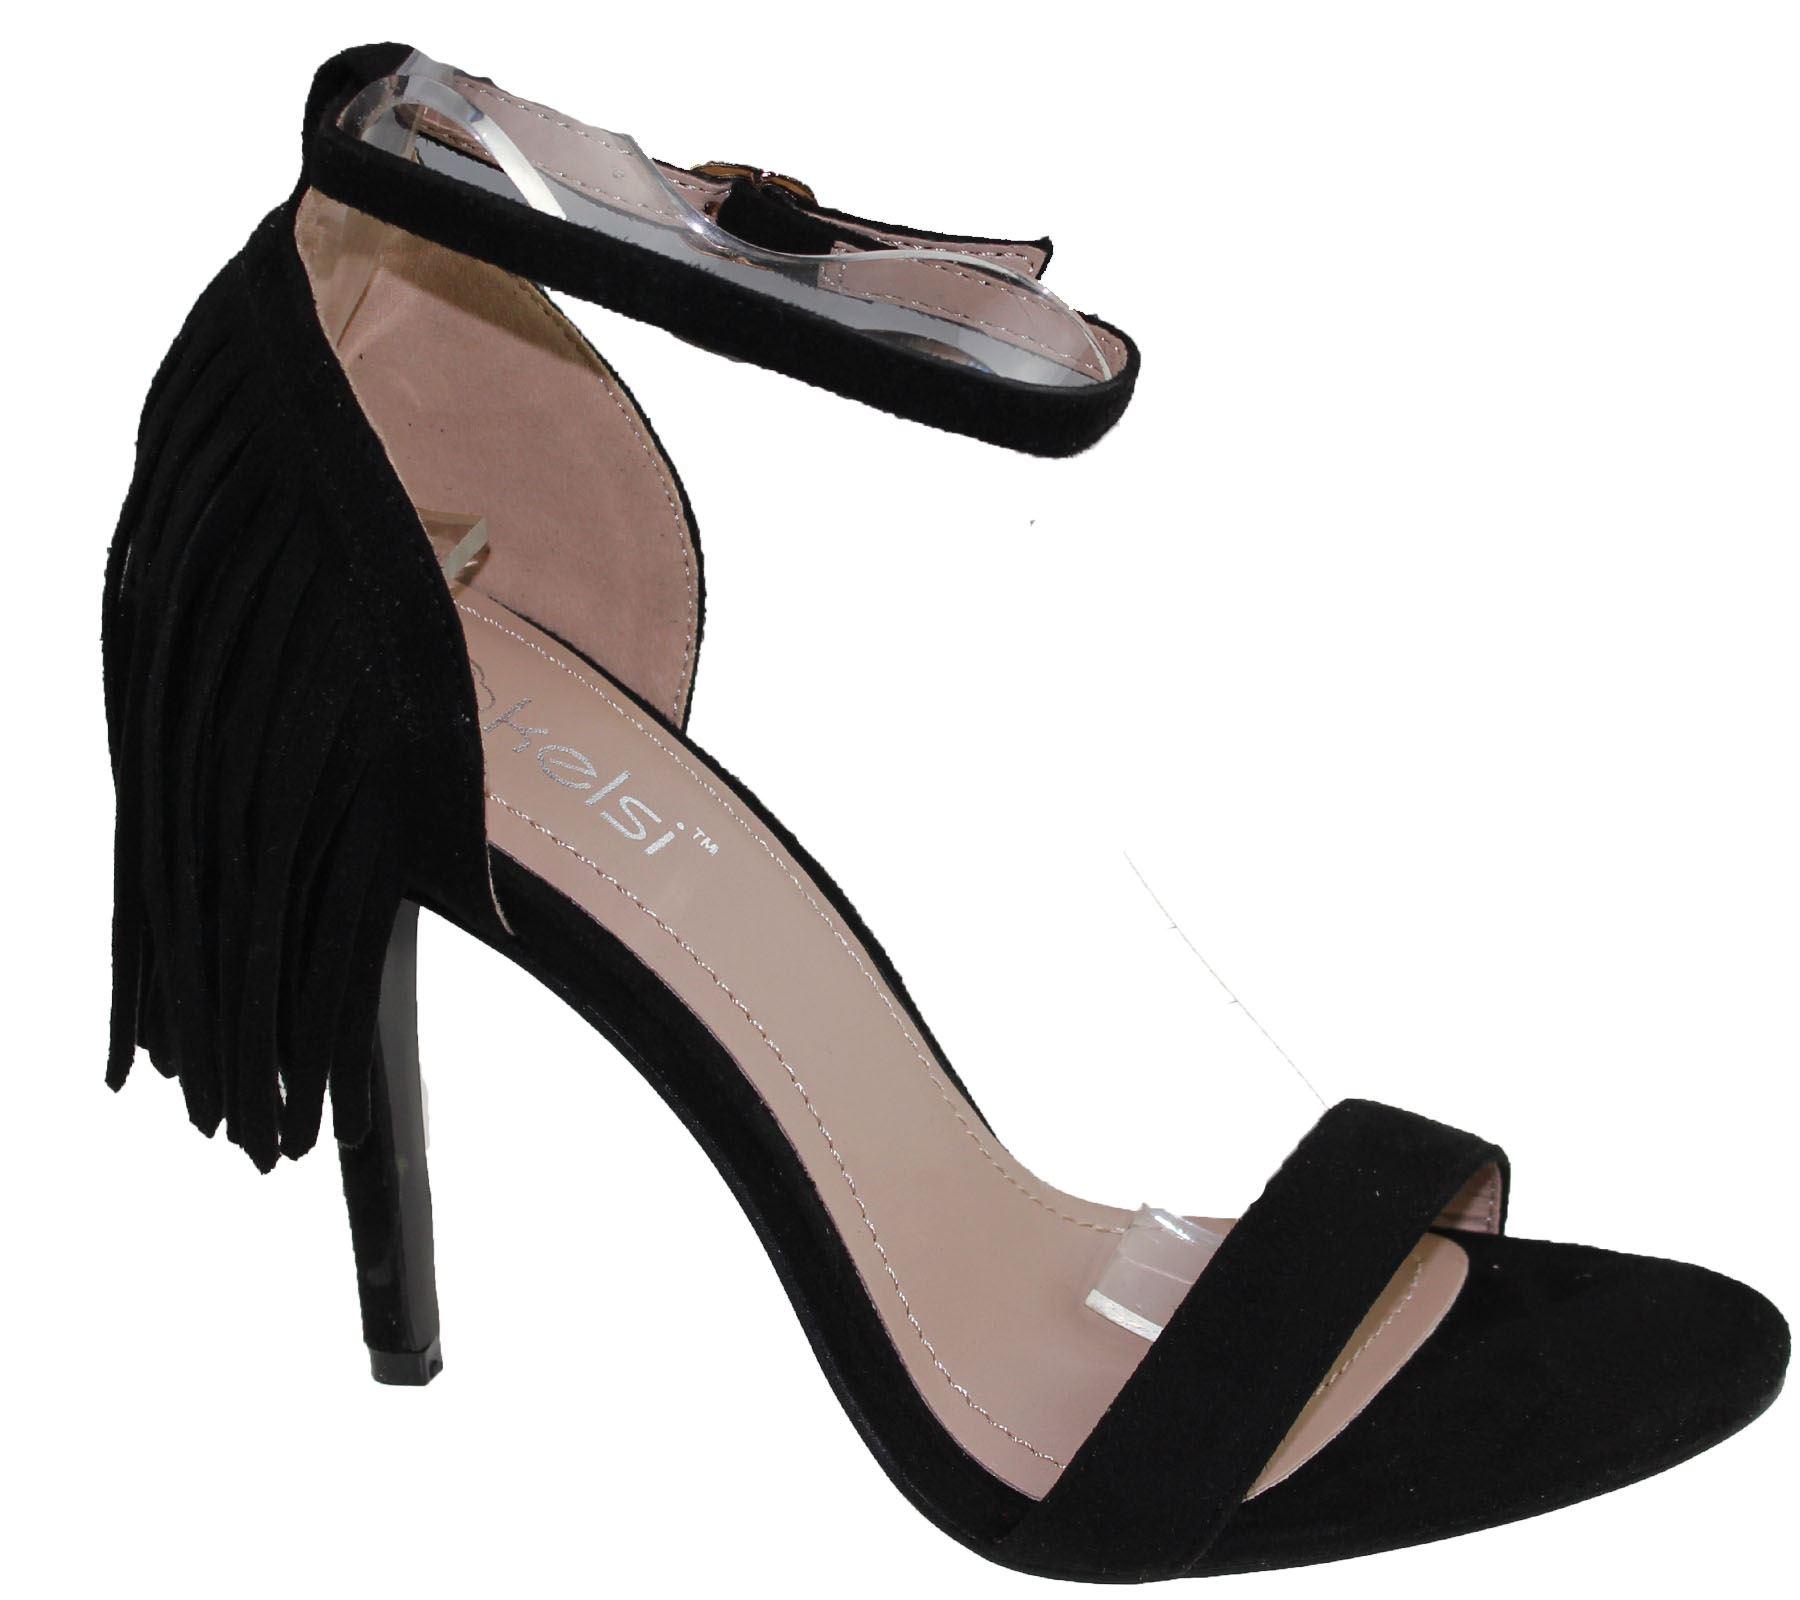 Sandalias de Mujer Stiletto Tacón alto puntera abierta con borlas Damas Zapatos De Tobillo De Verano